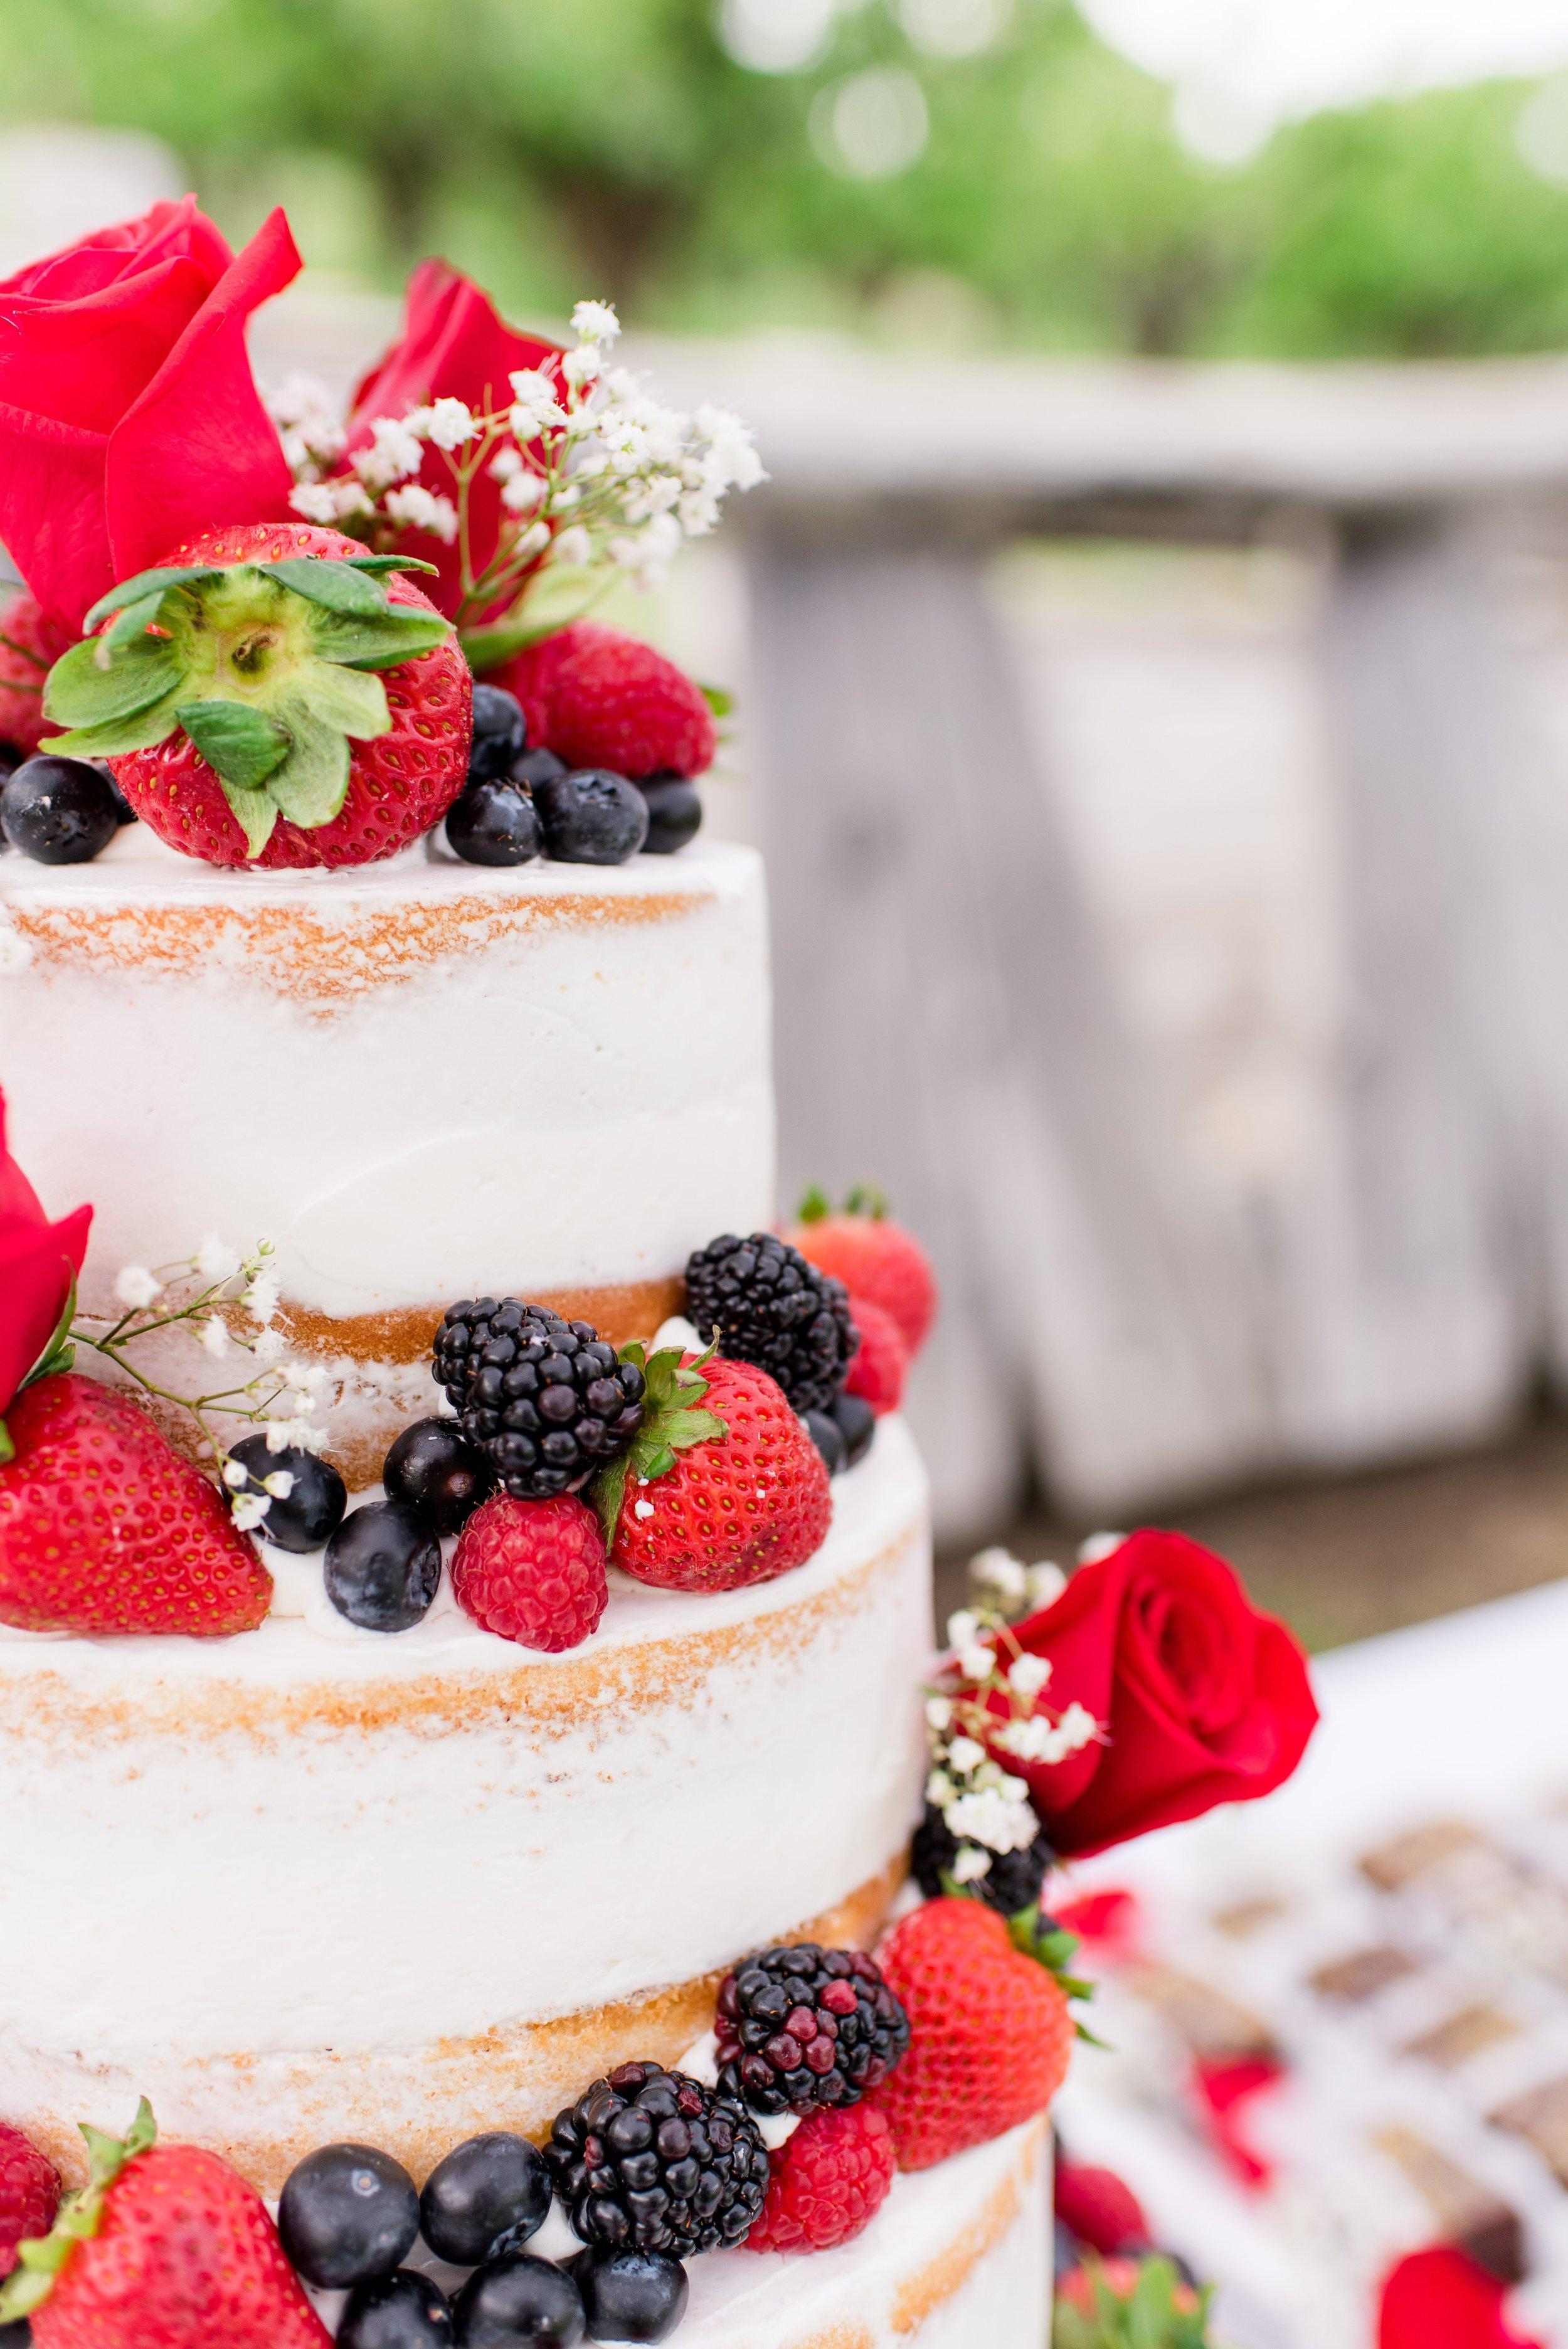 Naked Cake with Berries - Wenatchee, Washington White Barn Wedding - Hampton Hideaway - Morgan Tayler Photo & Design - Wenatchee Wedding Photographer